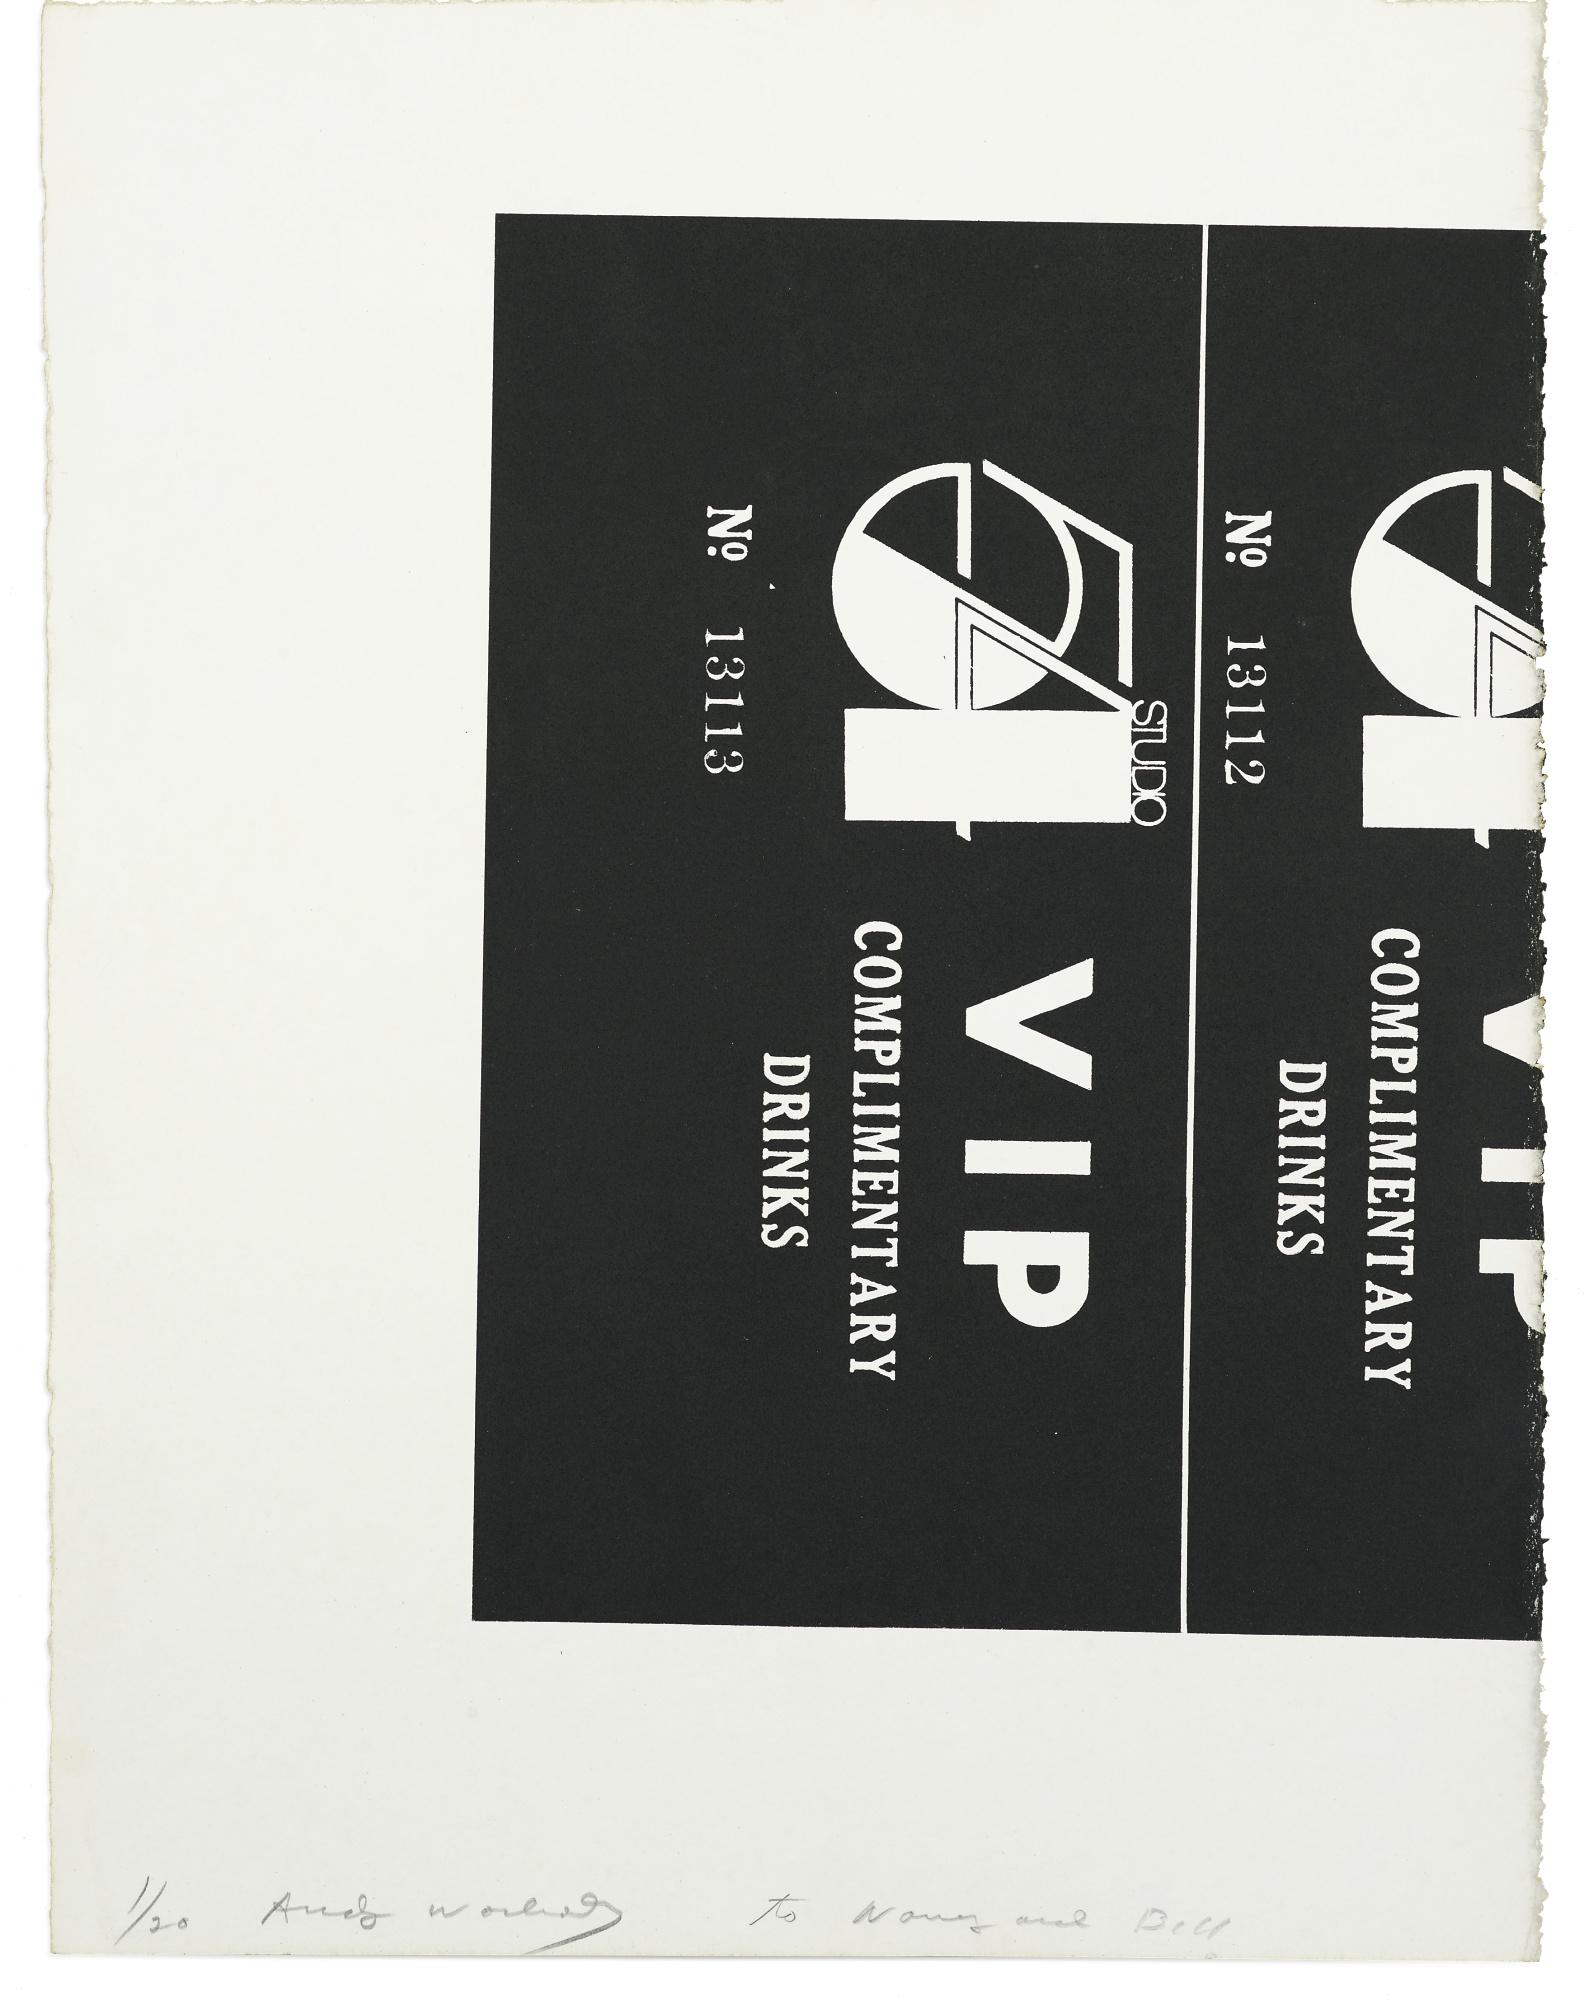 Andy Warhol-Studio 54 Complimentary Drink Invitation-1978